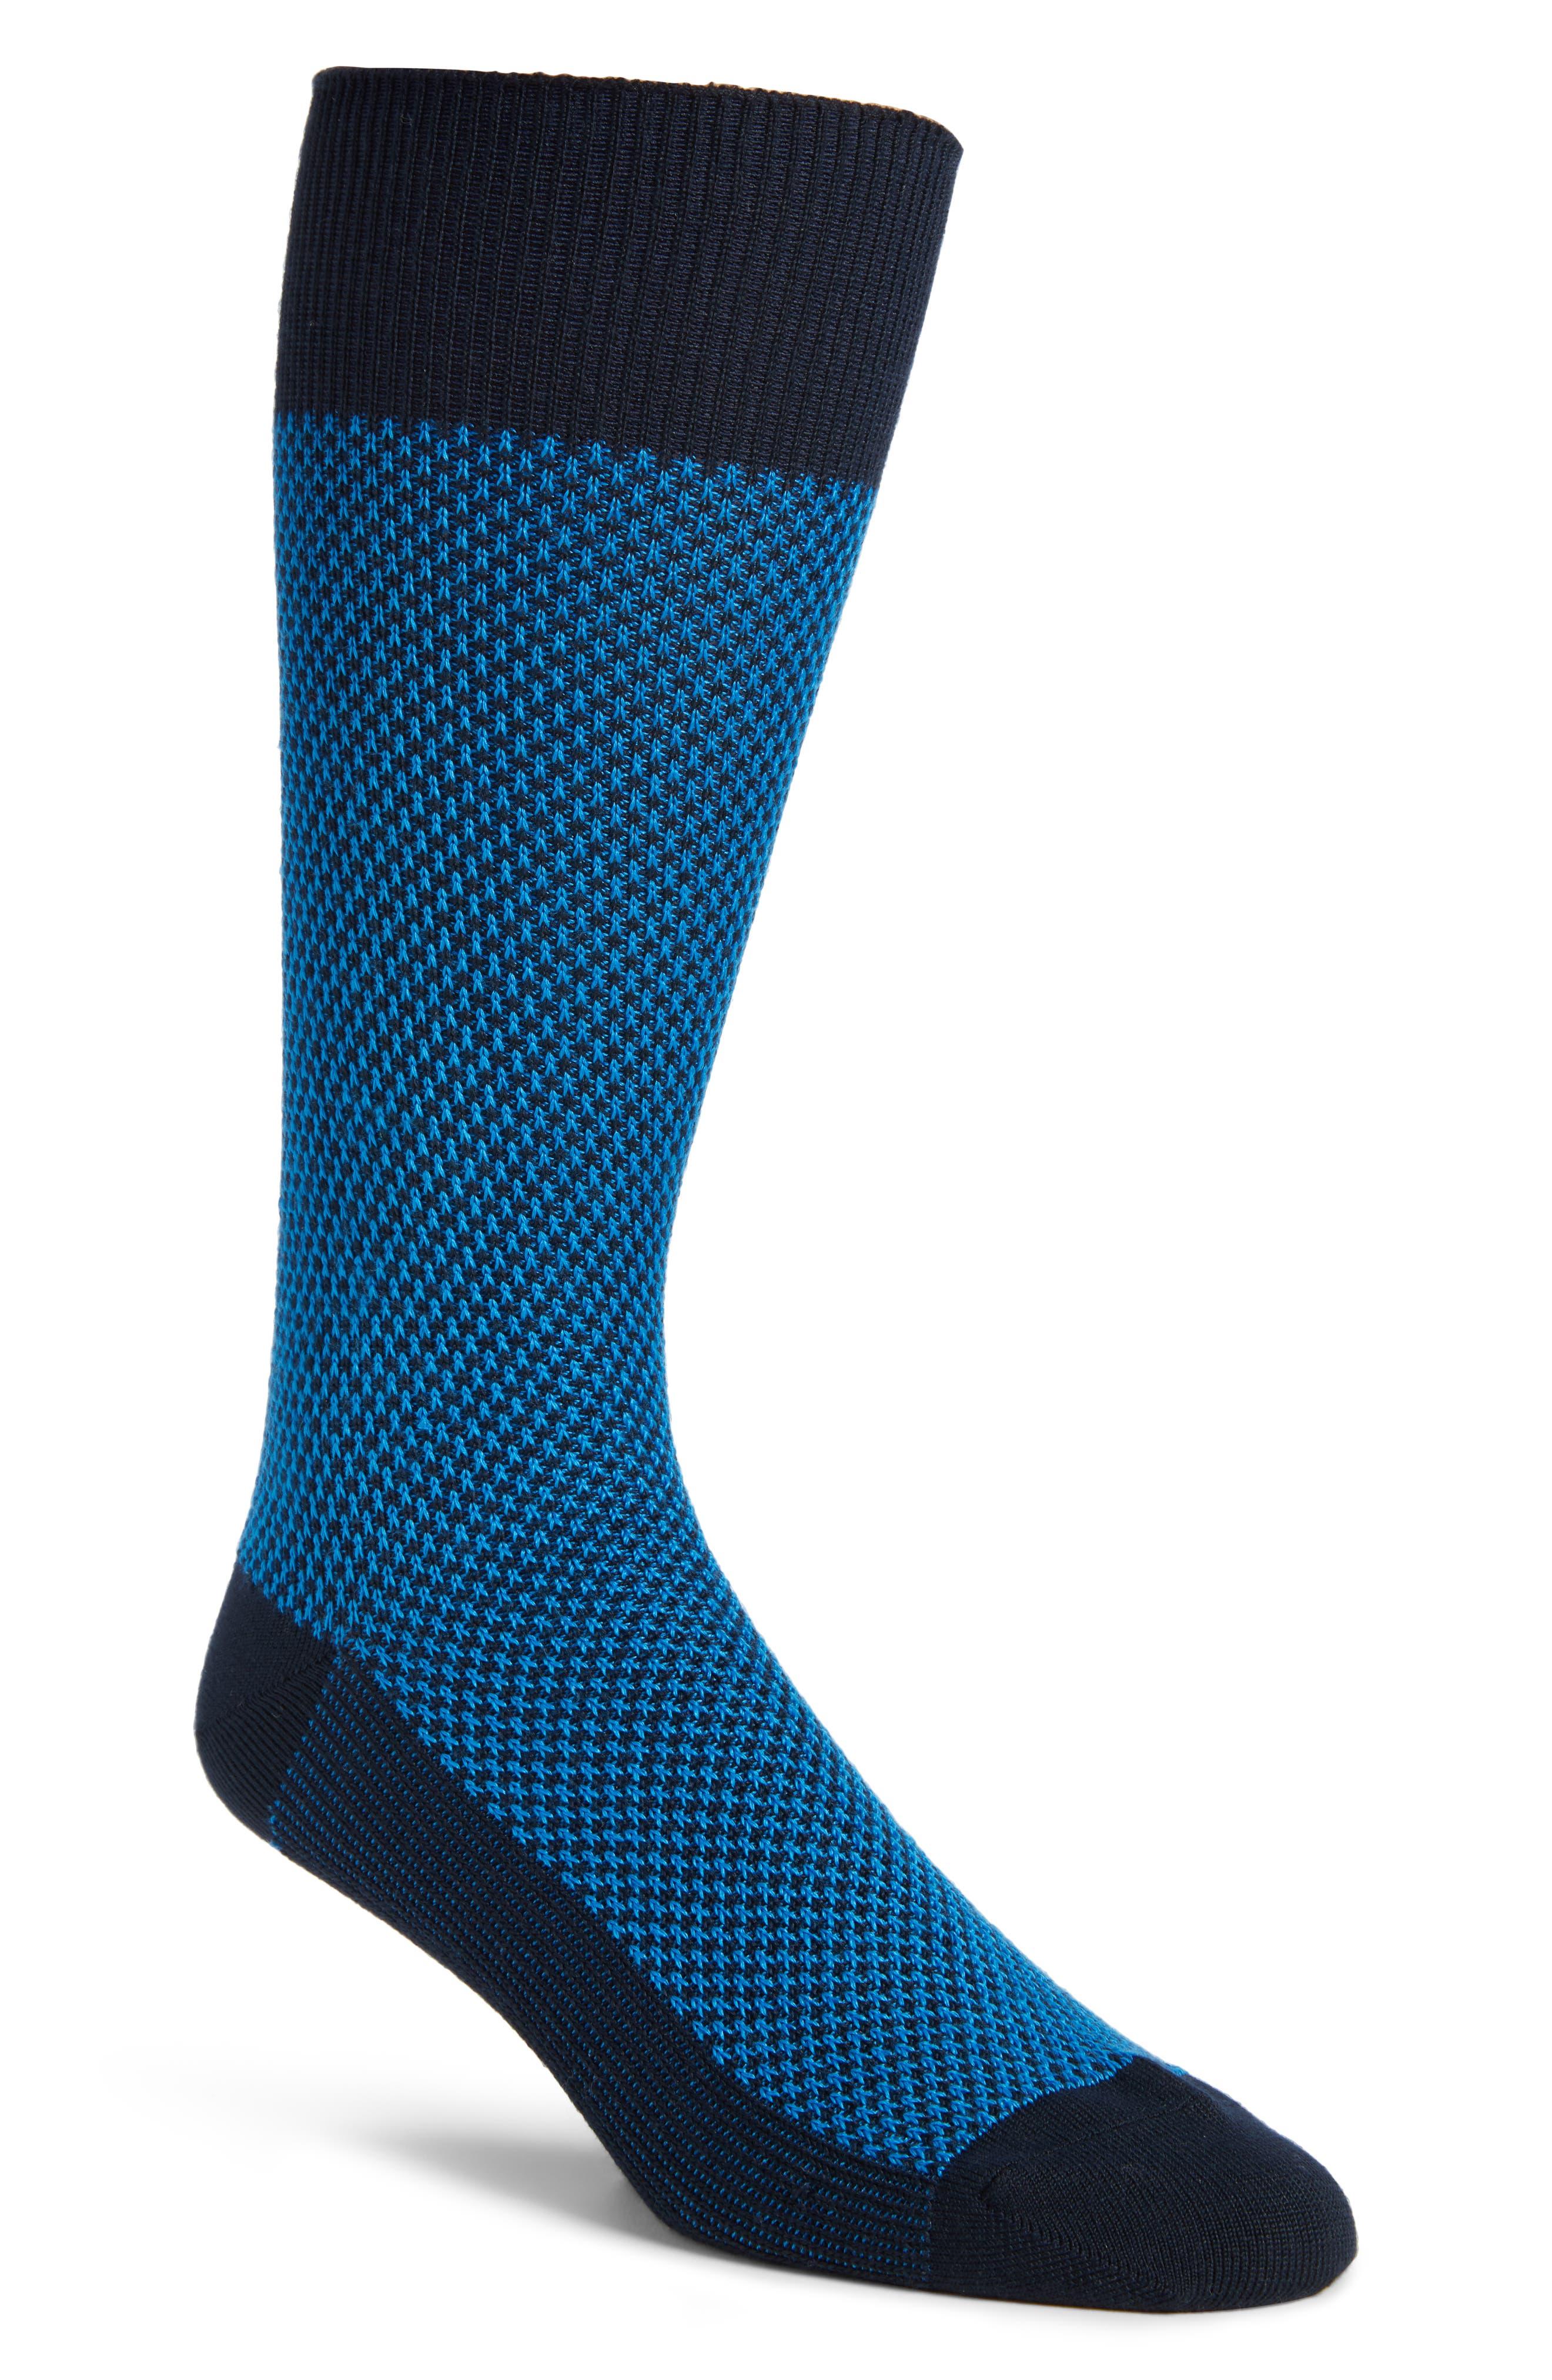 Ultra Soft Textured Socks,                             Main thumbnail 1, color,                             Navy/ Blue